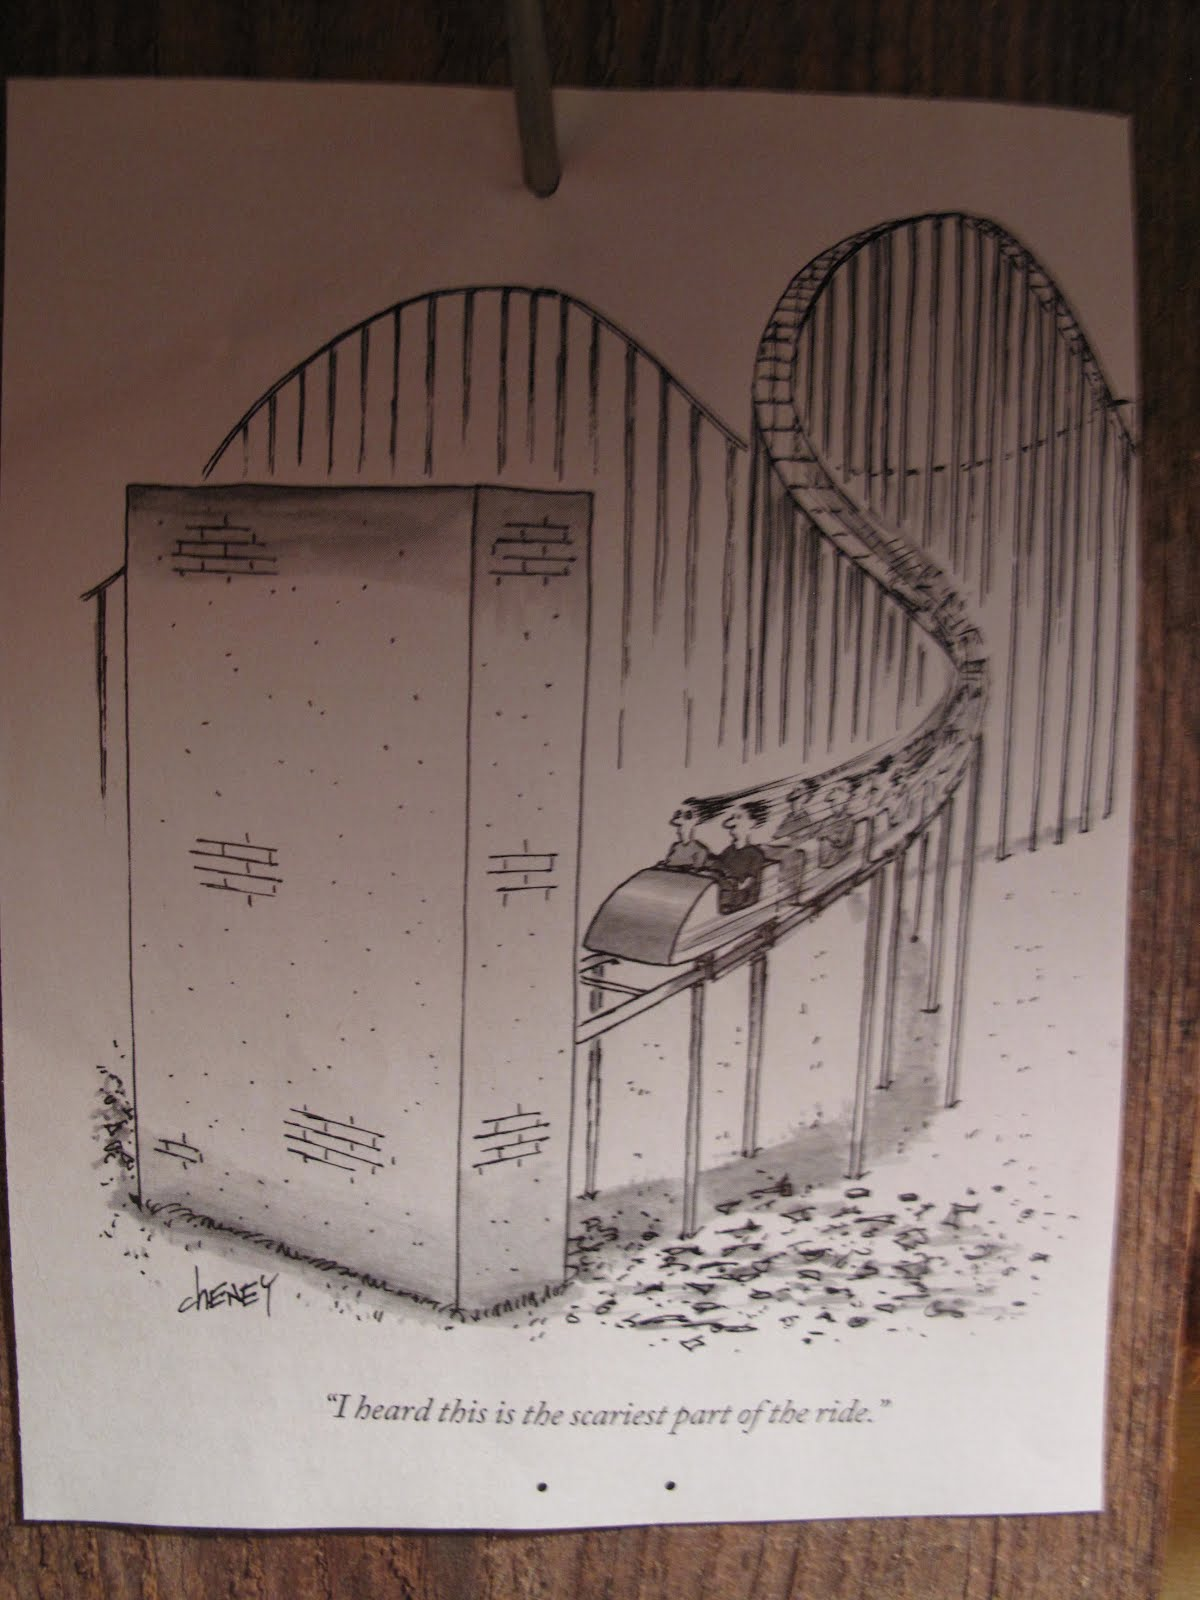 A Longhouse Birdhouse Feb 25 2012 Bald Eagle Anatomy Diagram Http Catherinecabrolcom 9 Baldeagle Please Click On The Image